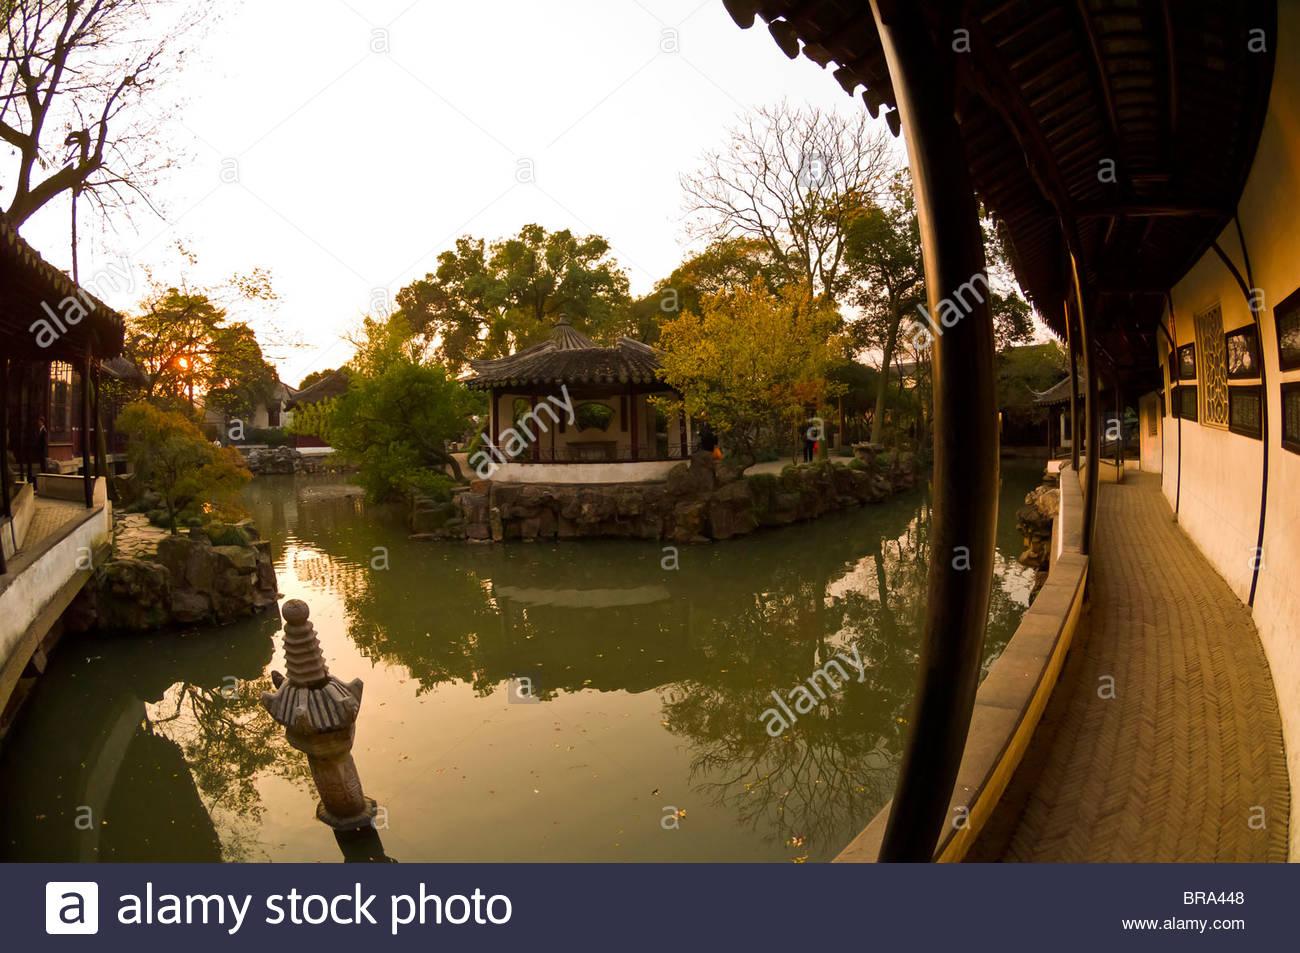 Humble Administrator's Garden, Suzhou, Chine Photo Stock